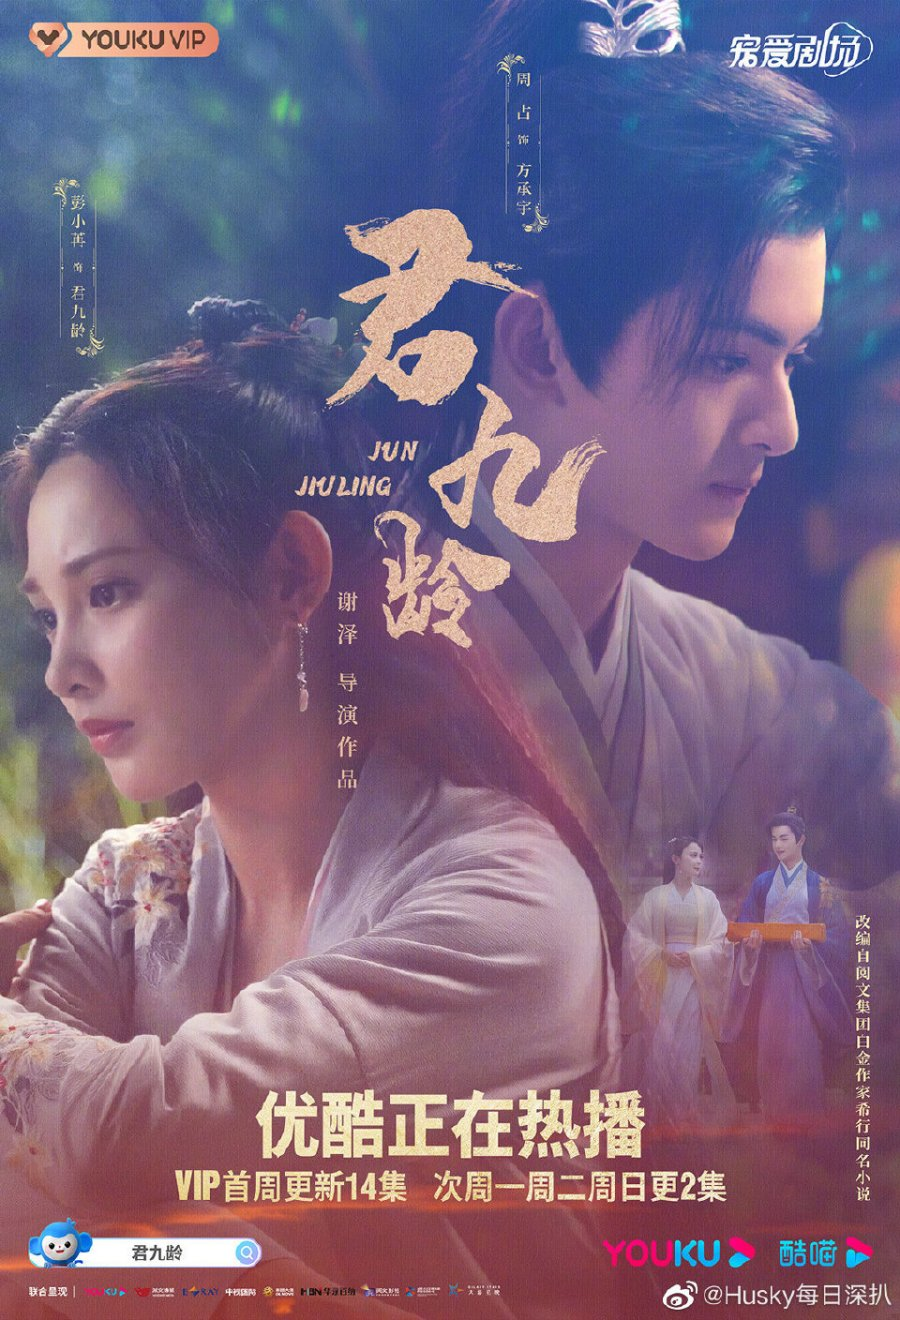 Jun Jiu Ling (2021) / 君九龄